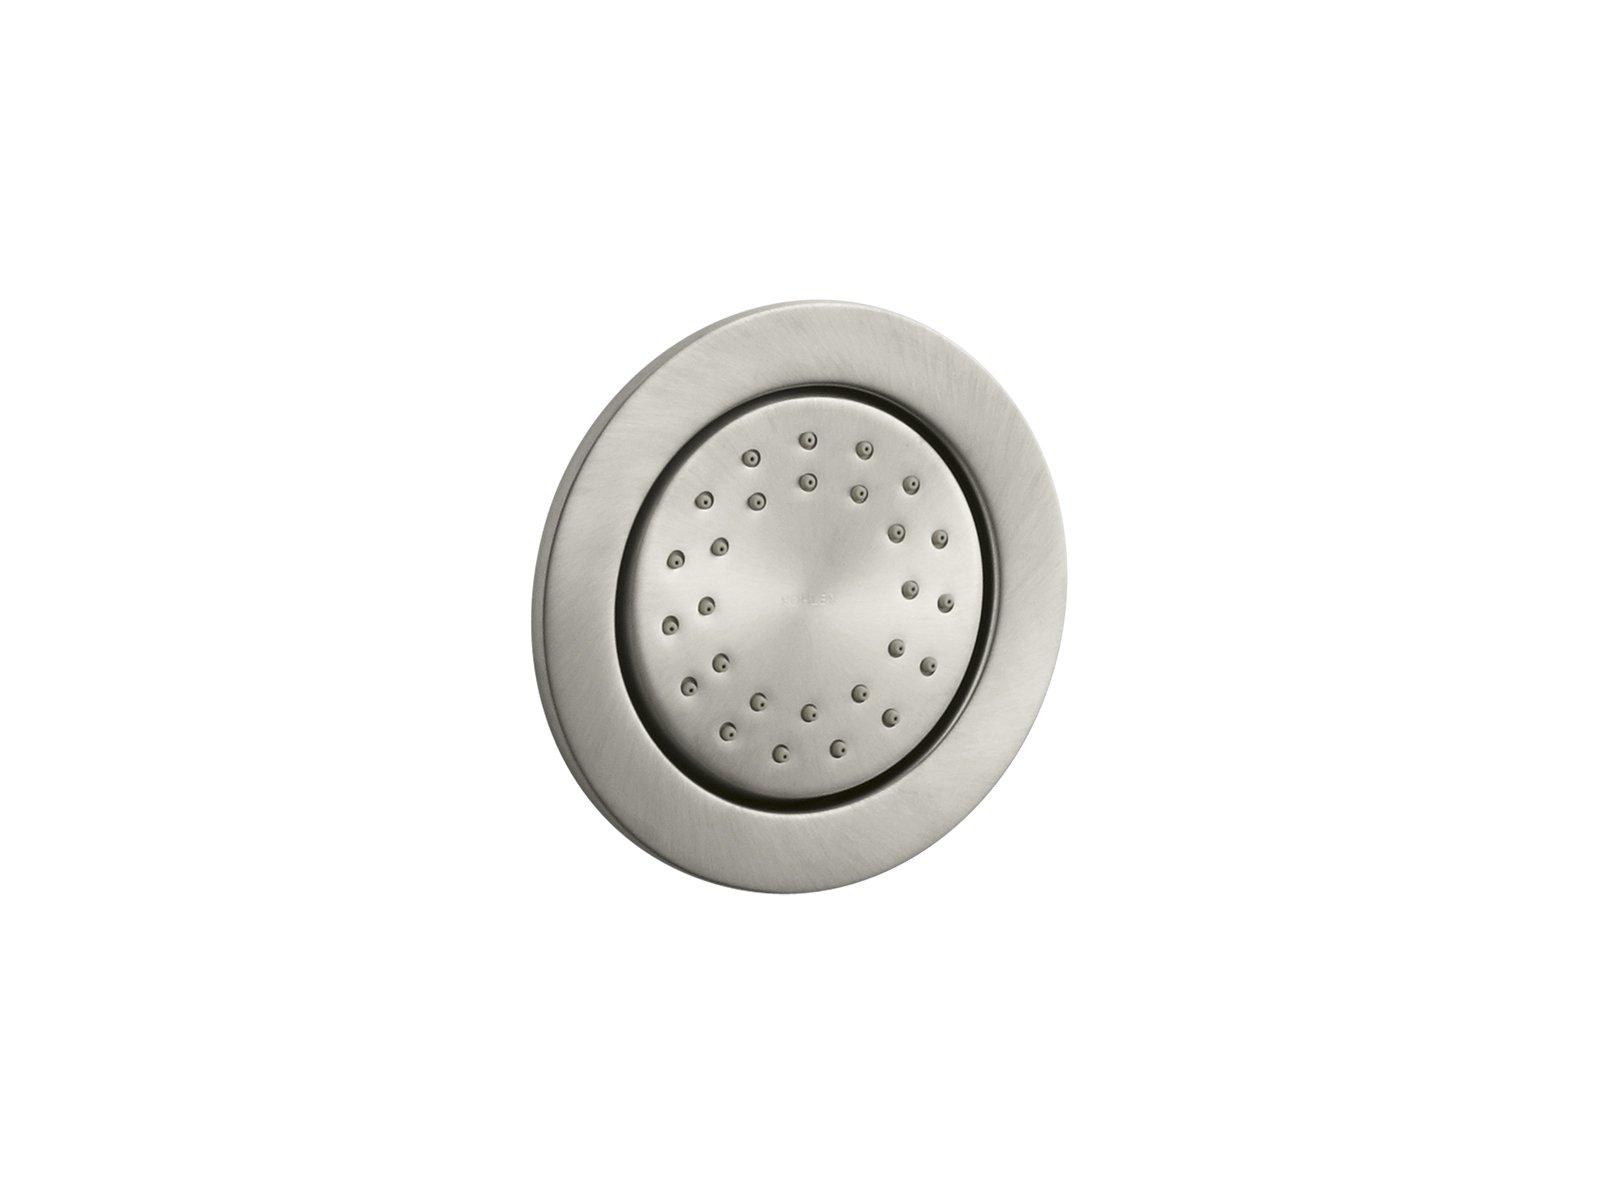 Kohler 8013-AK-BN Watertile Body Sprayer, Vibrant Brushed Nickel